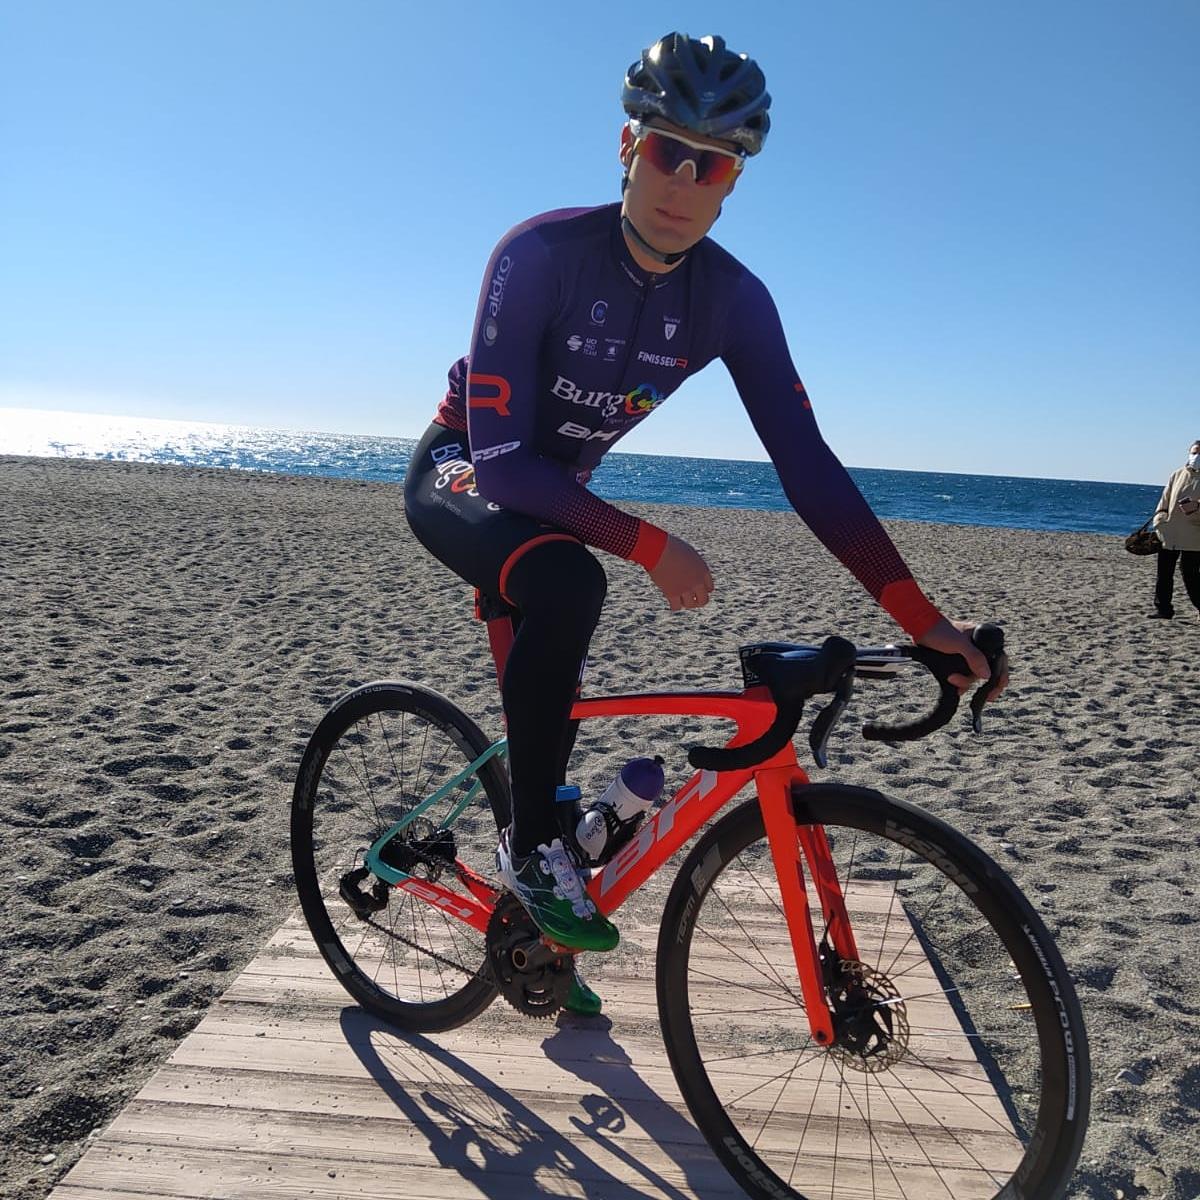 Burgos Cycling Kits 2021